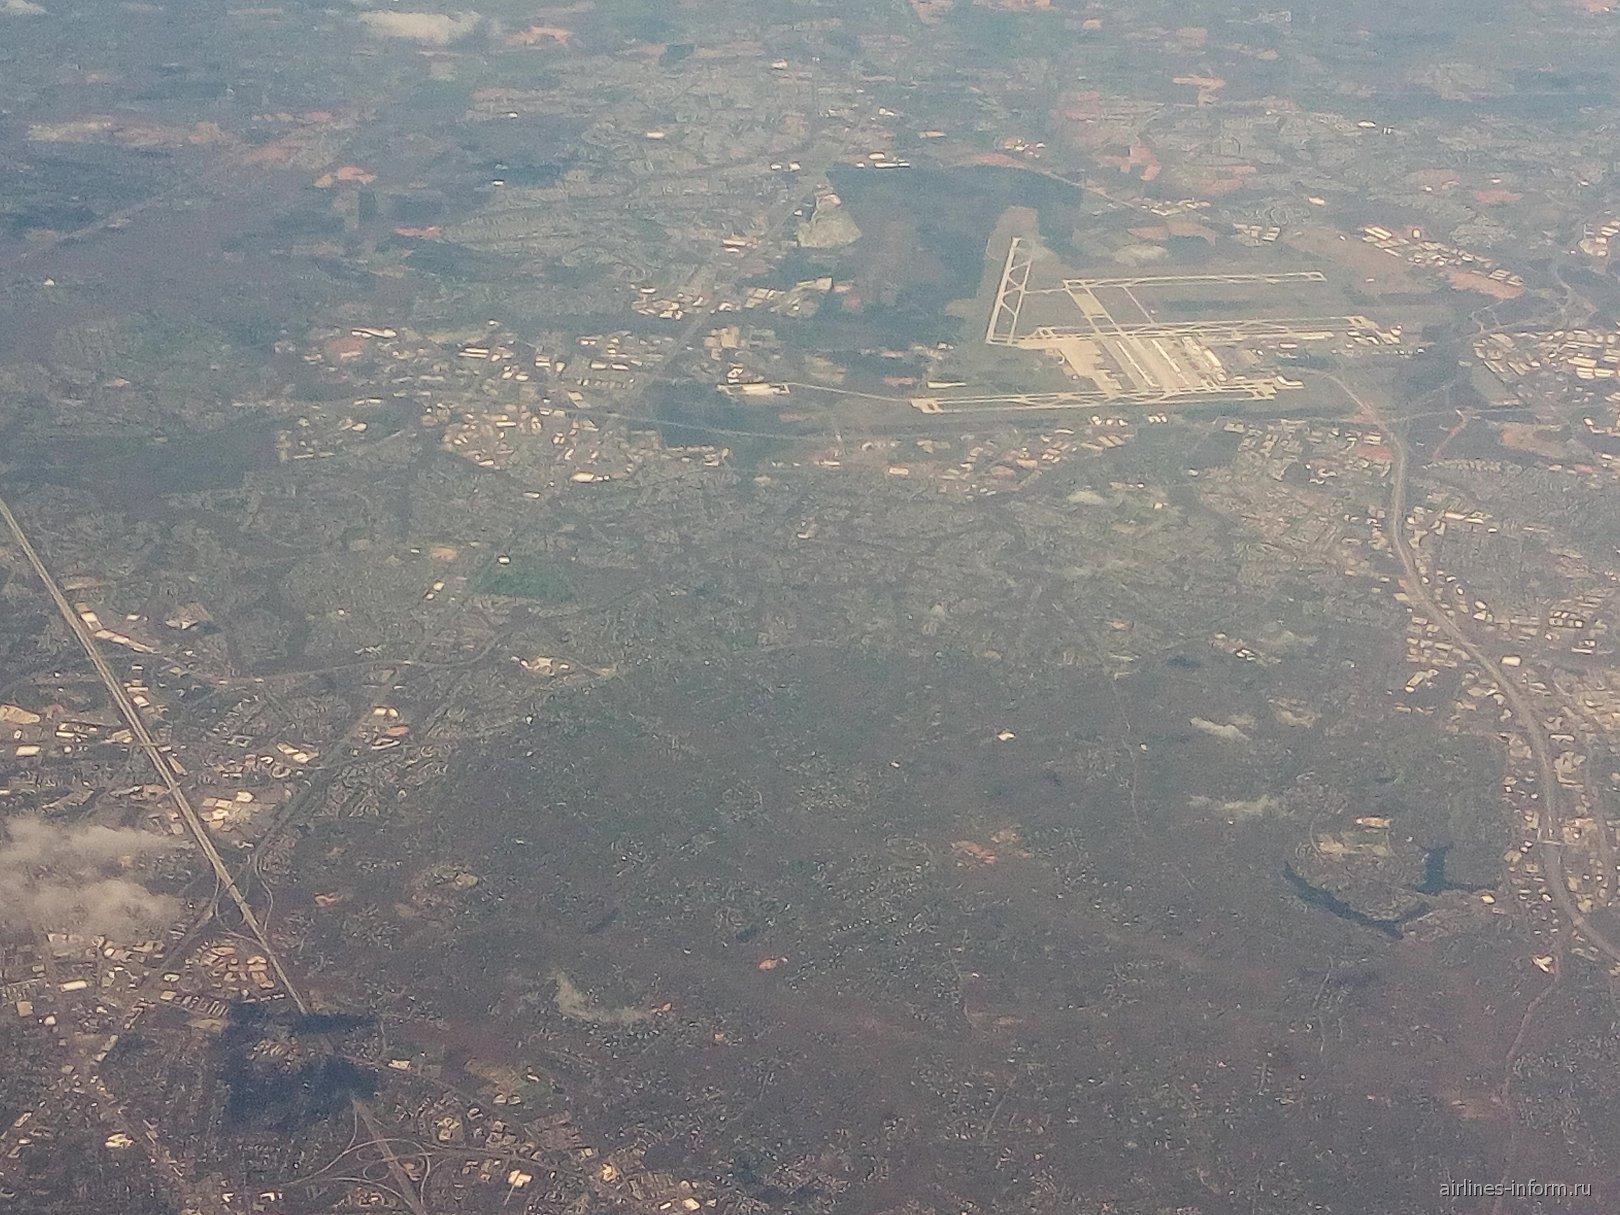 В полете над США рейсом Москва-Гавана